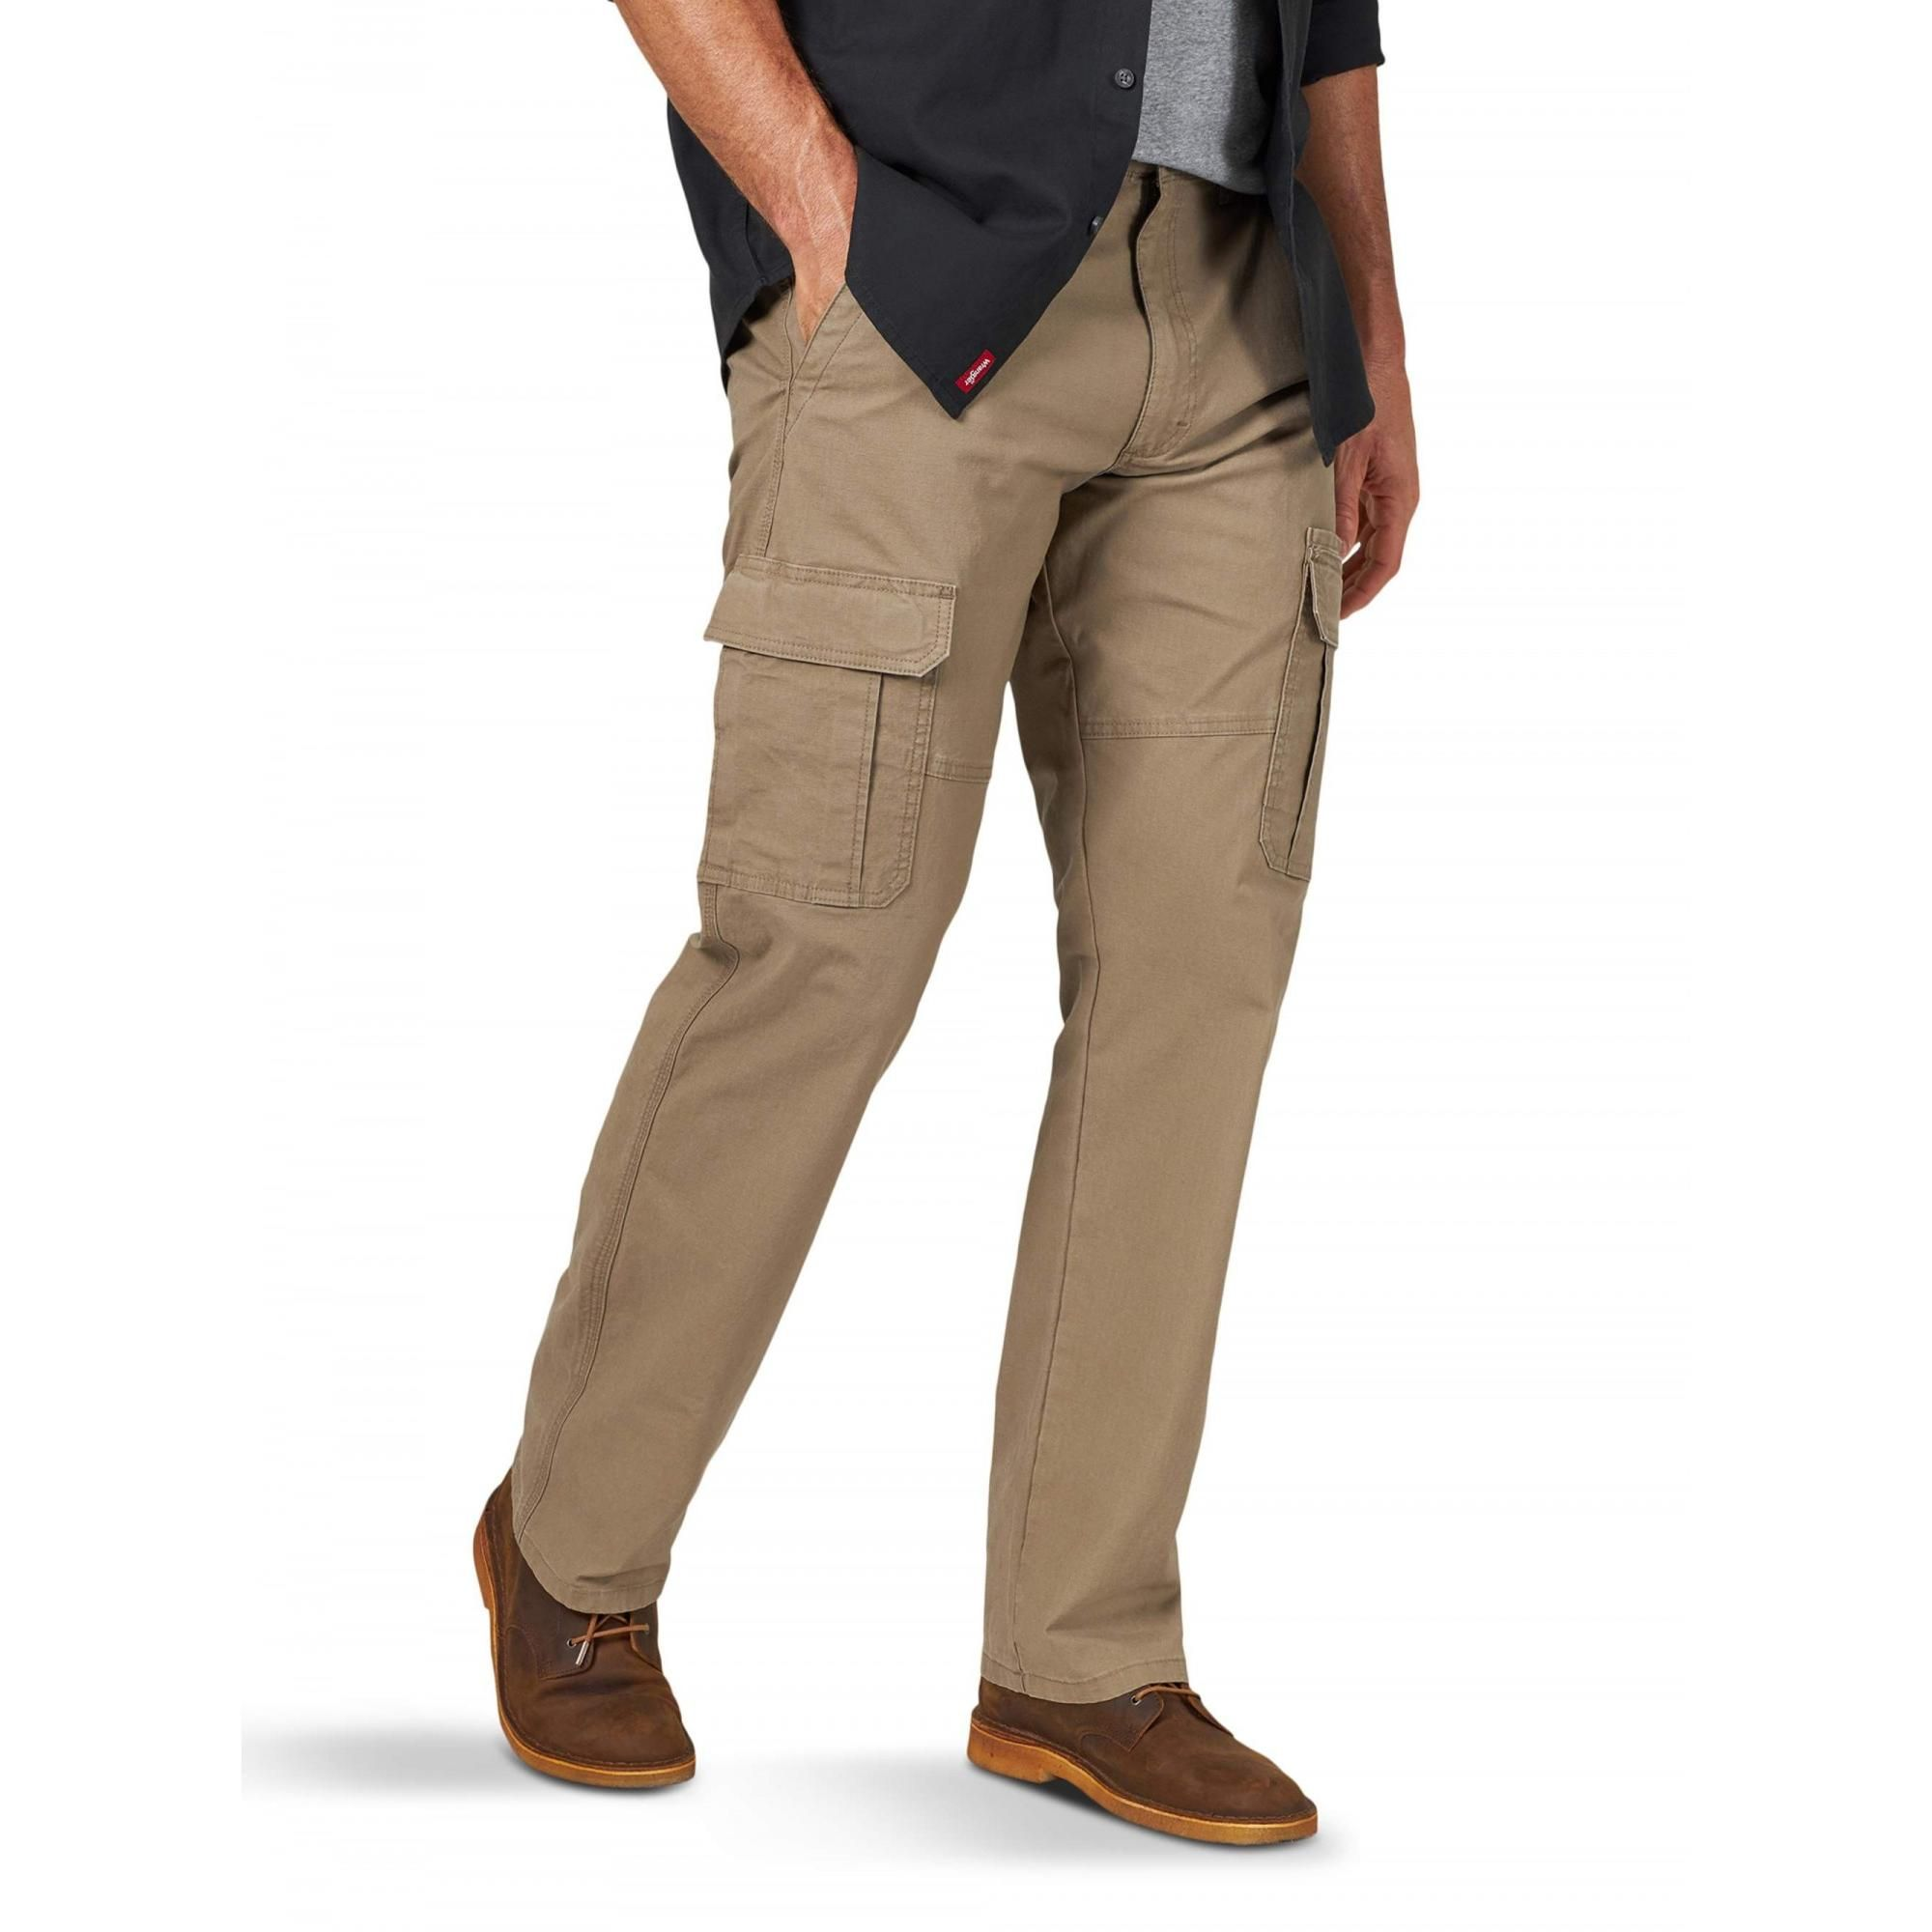 Wrangler Wrangler Men S And Big Men S Relaxed Fit Cargo Pant With Stretch Walmart Com Cargo Pant Relaxed Fit Big Men [ 2000 x 2000 Pixel ]